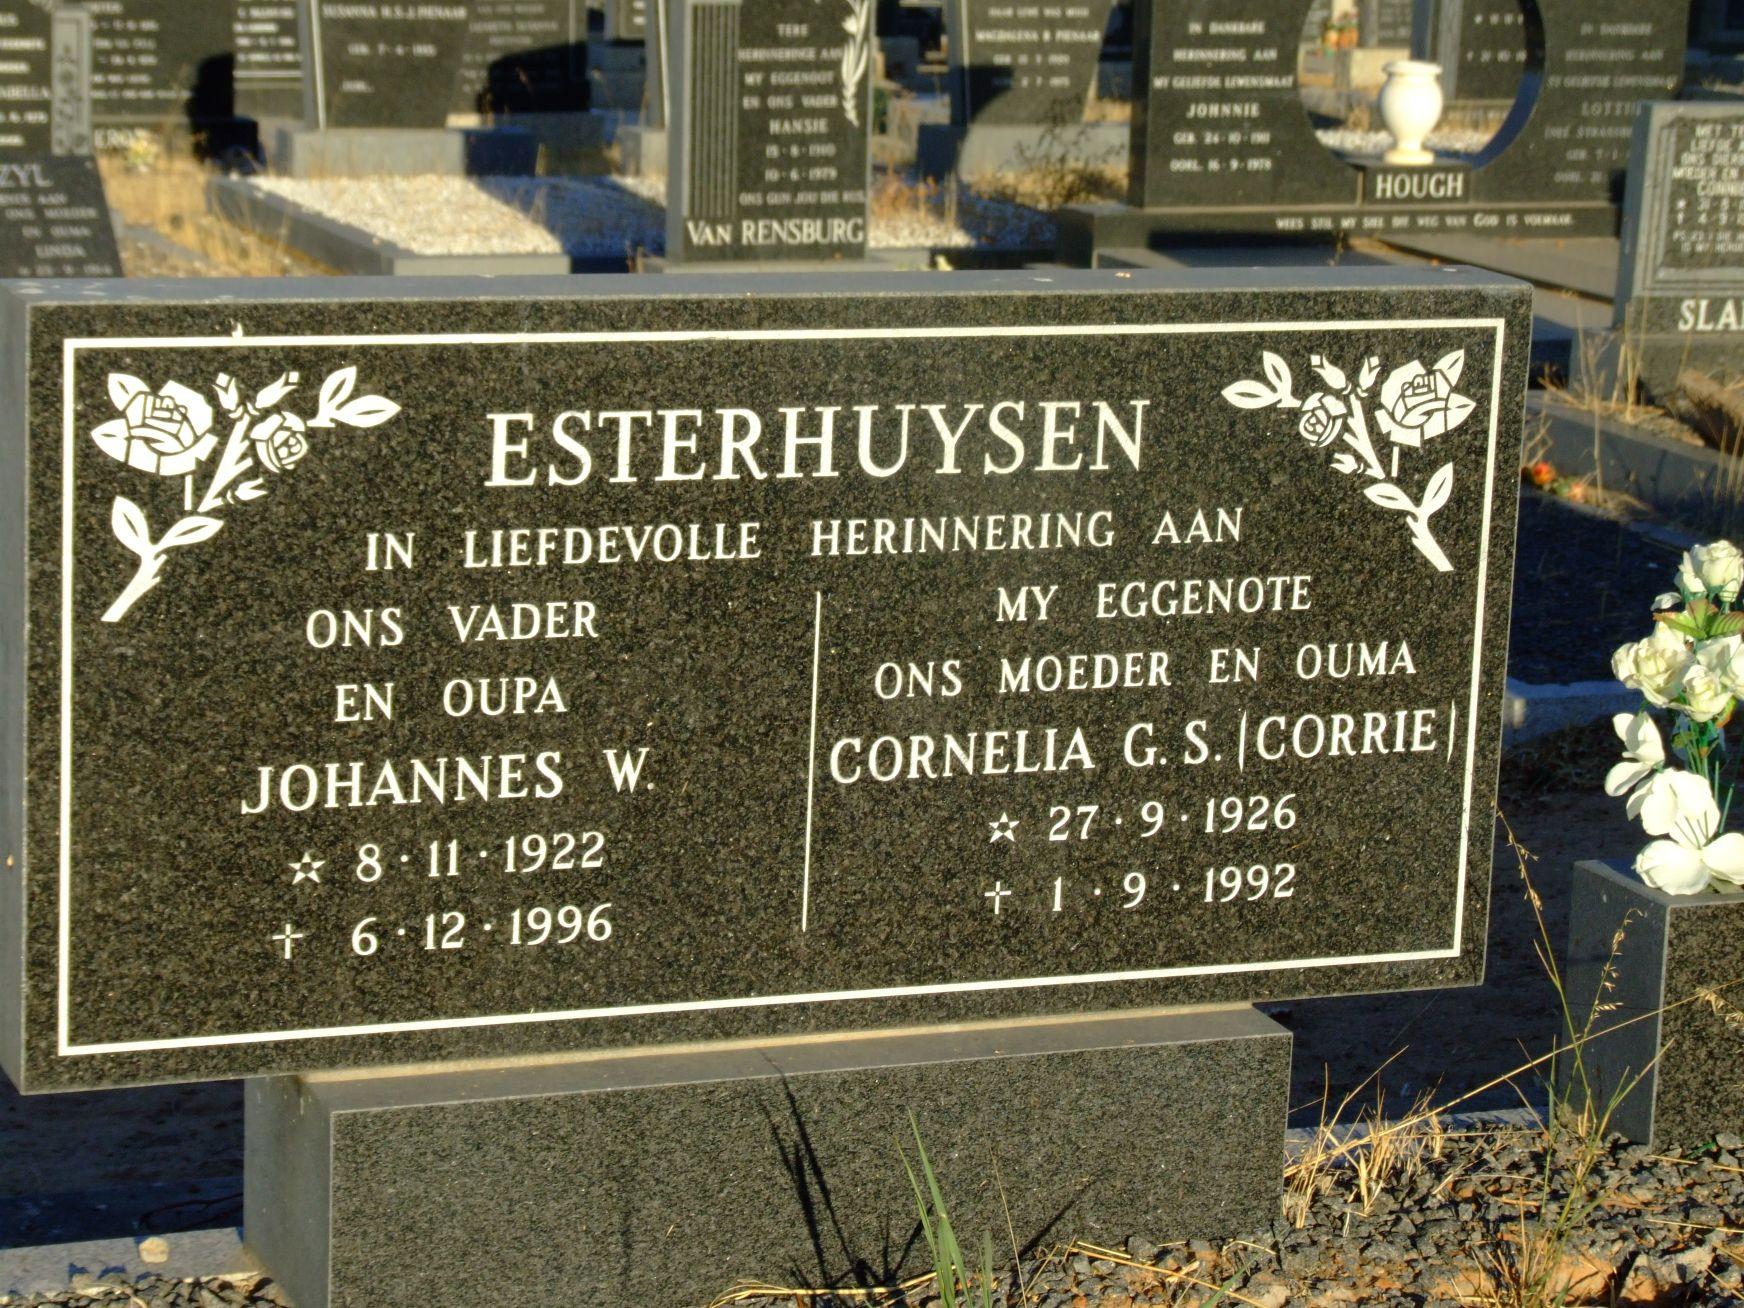 Esterhuysen, Johannes W. and Esterhuysen, Cornelia G. S. (Corrie